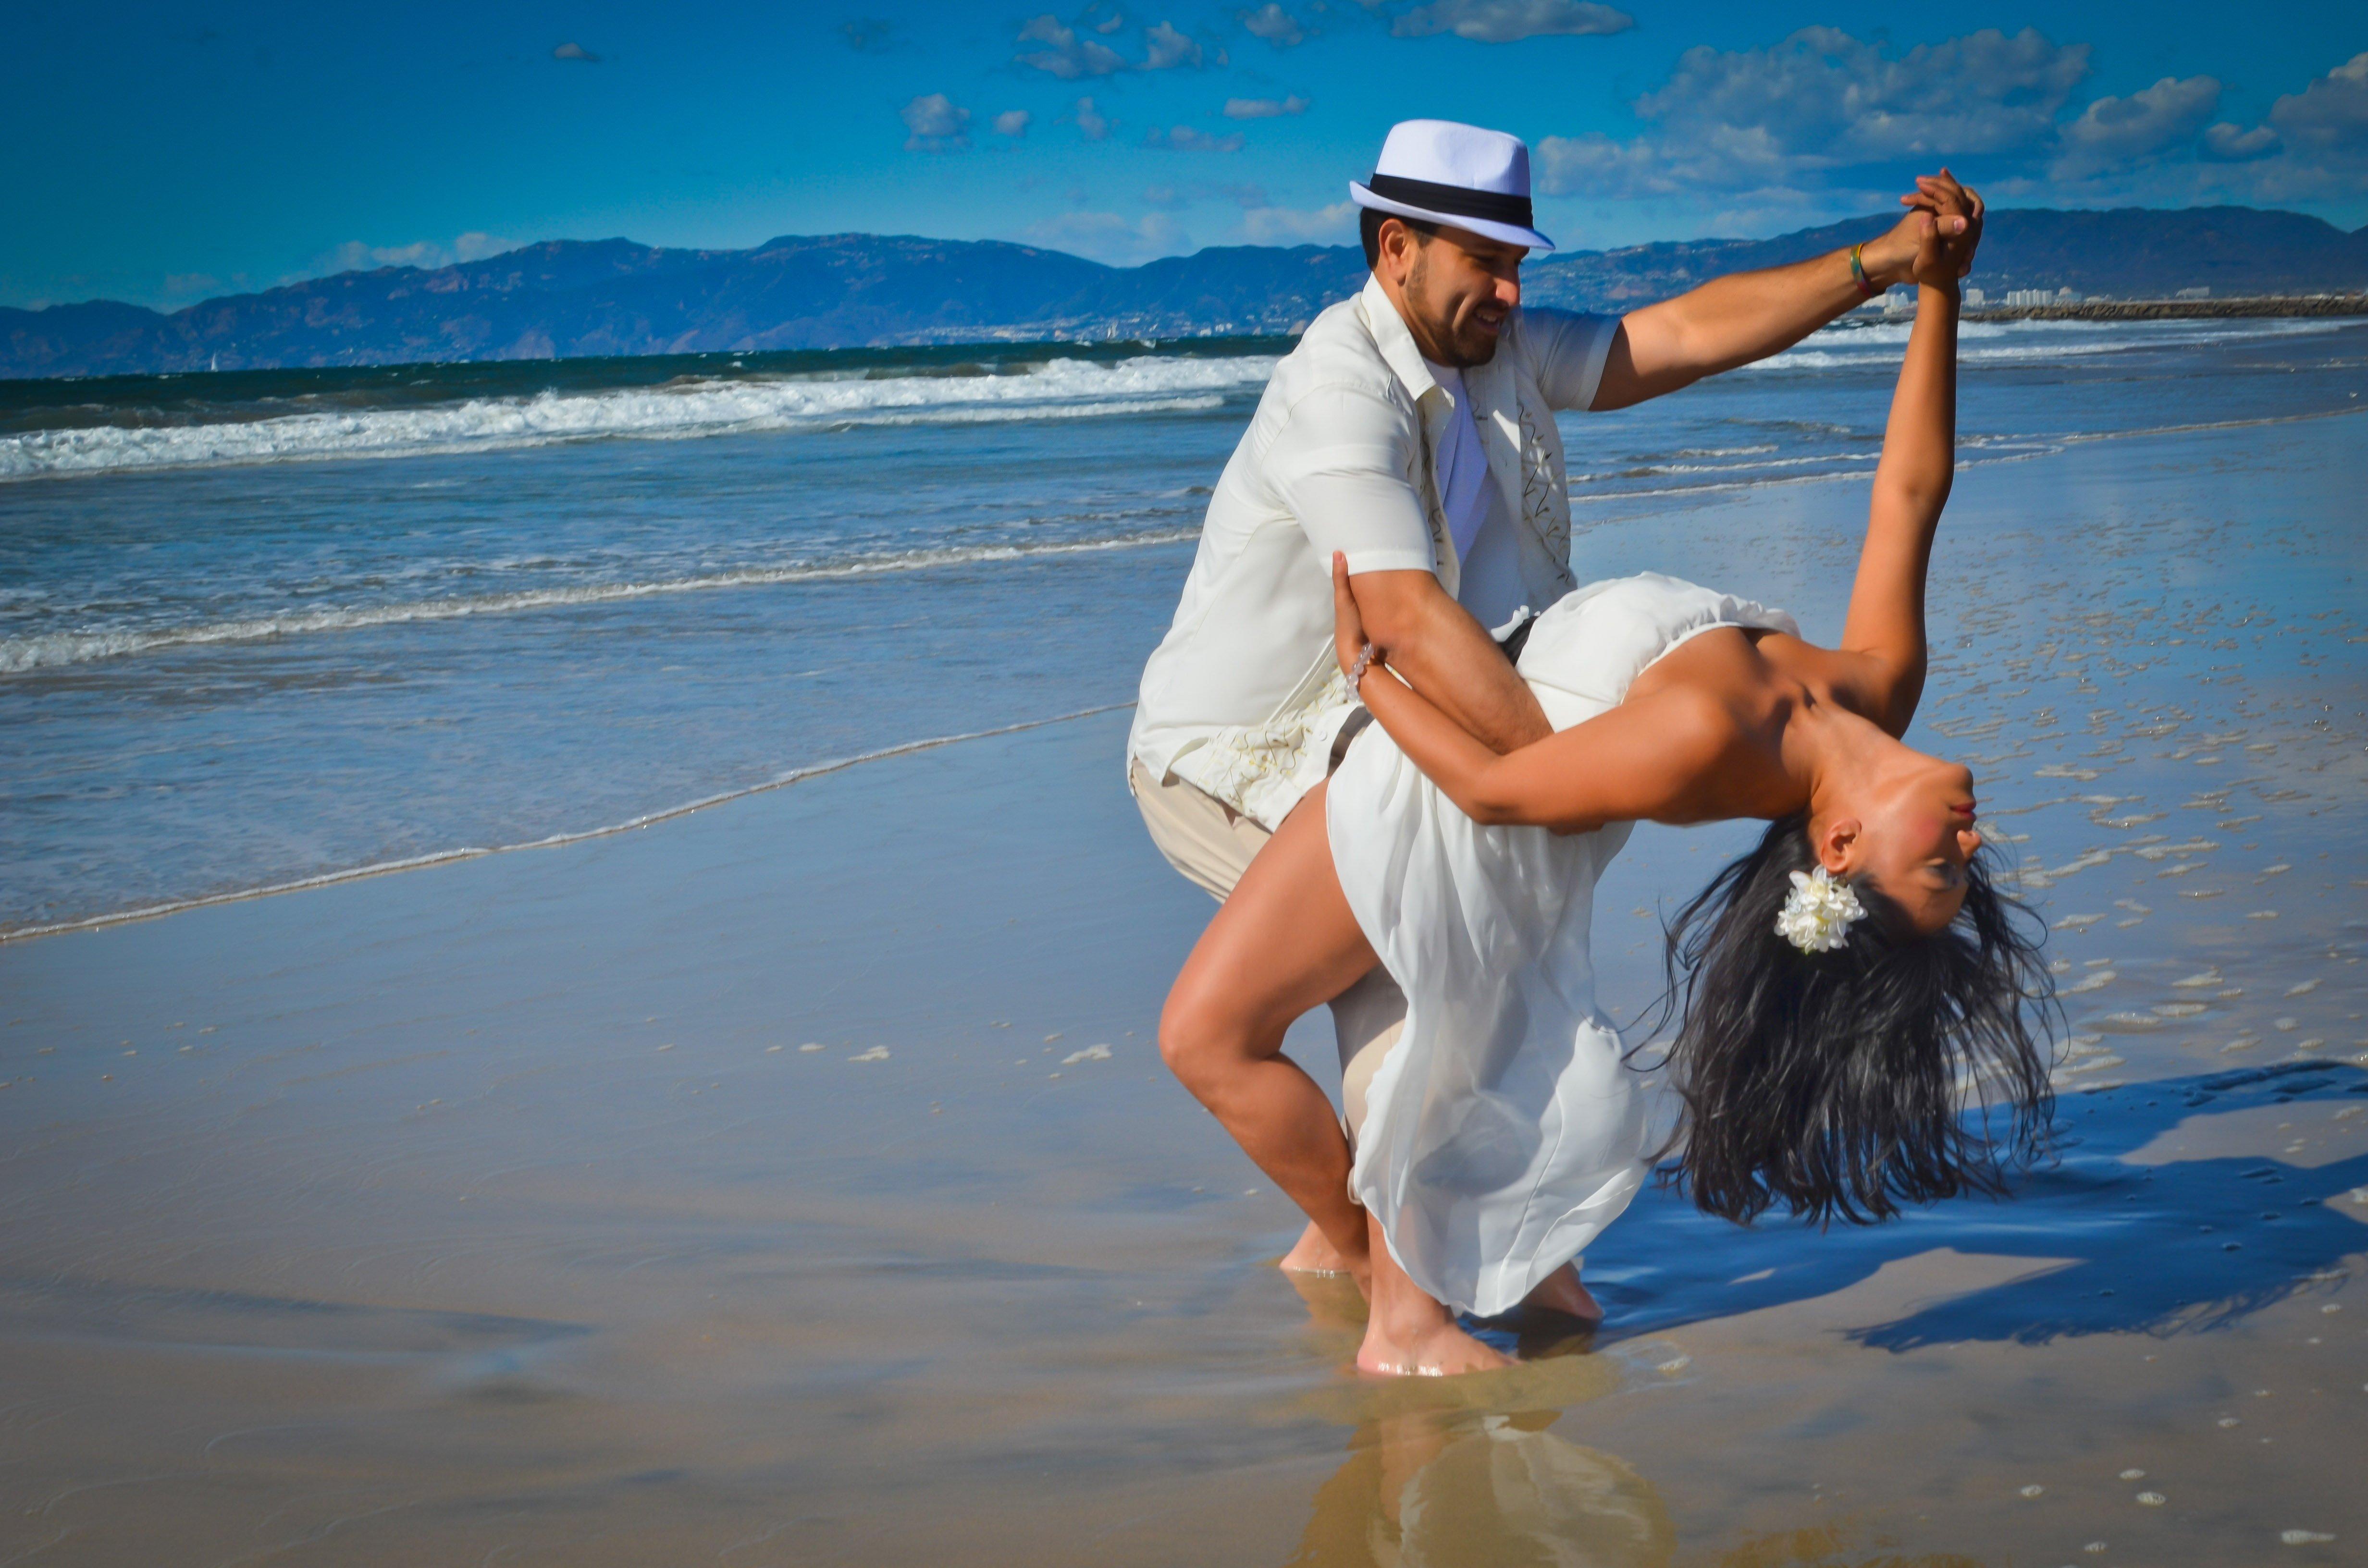 salsa_dancing_dance_4928x3264